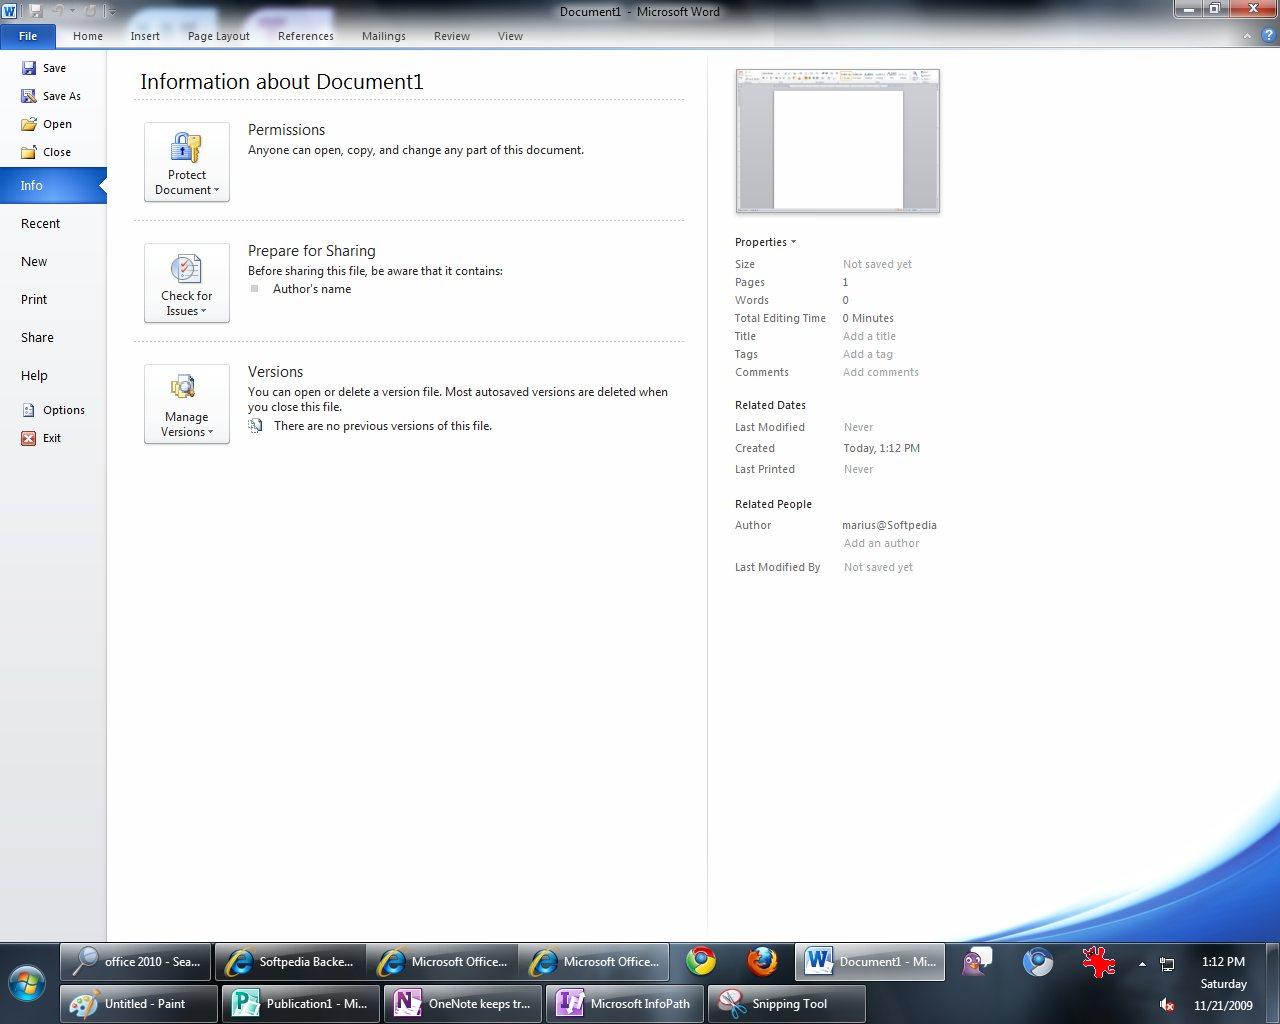 Microsoft Office 2010 [Full-Español]-[1 Link] full - Descargar Gratis